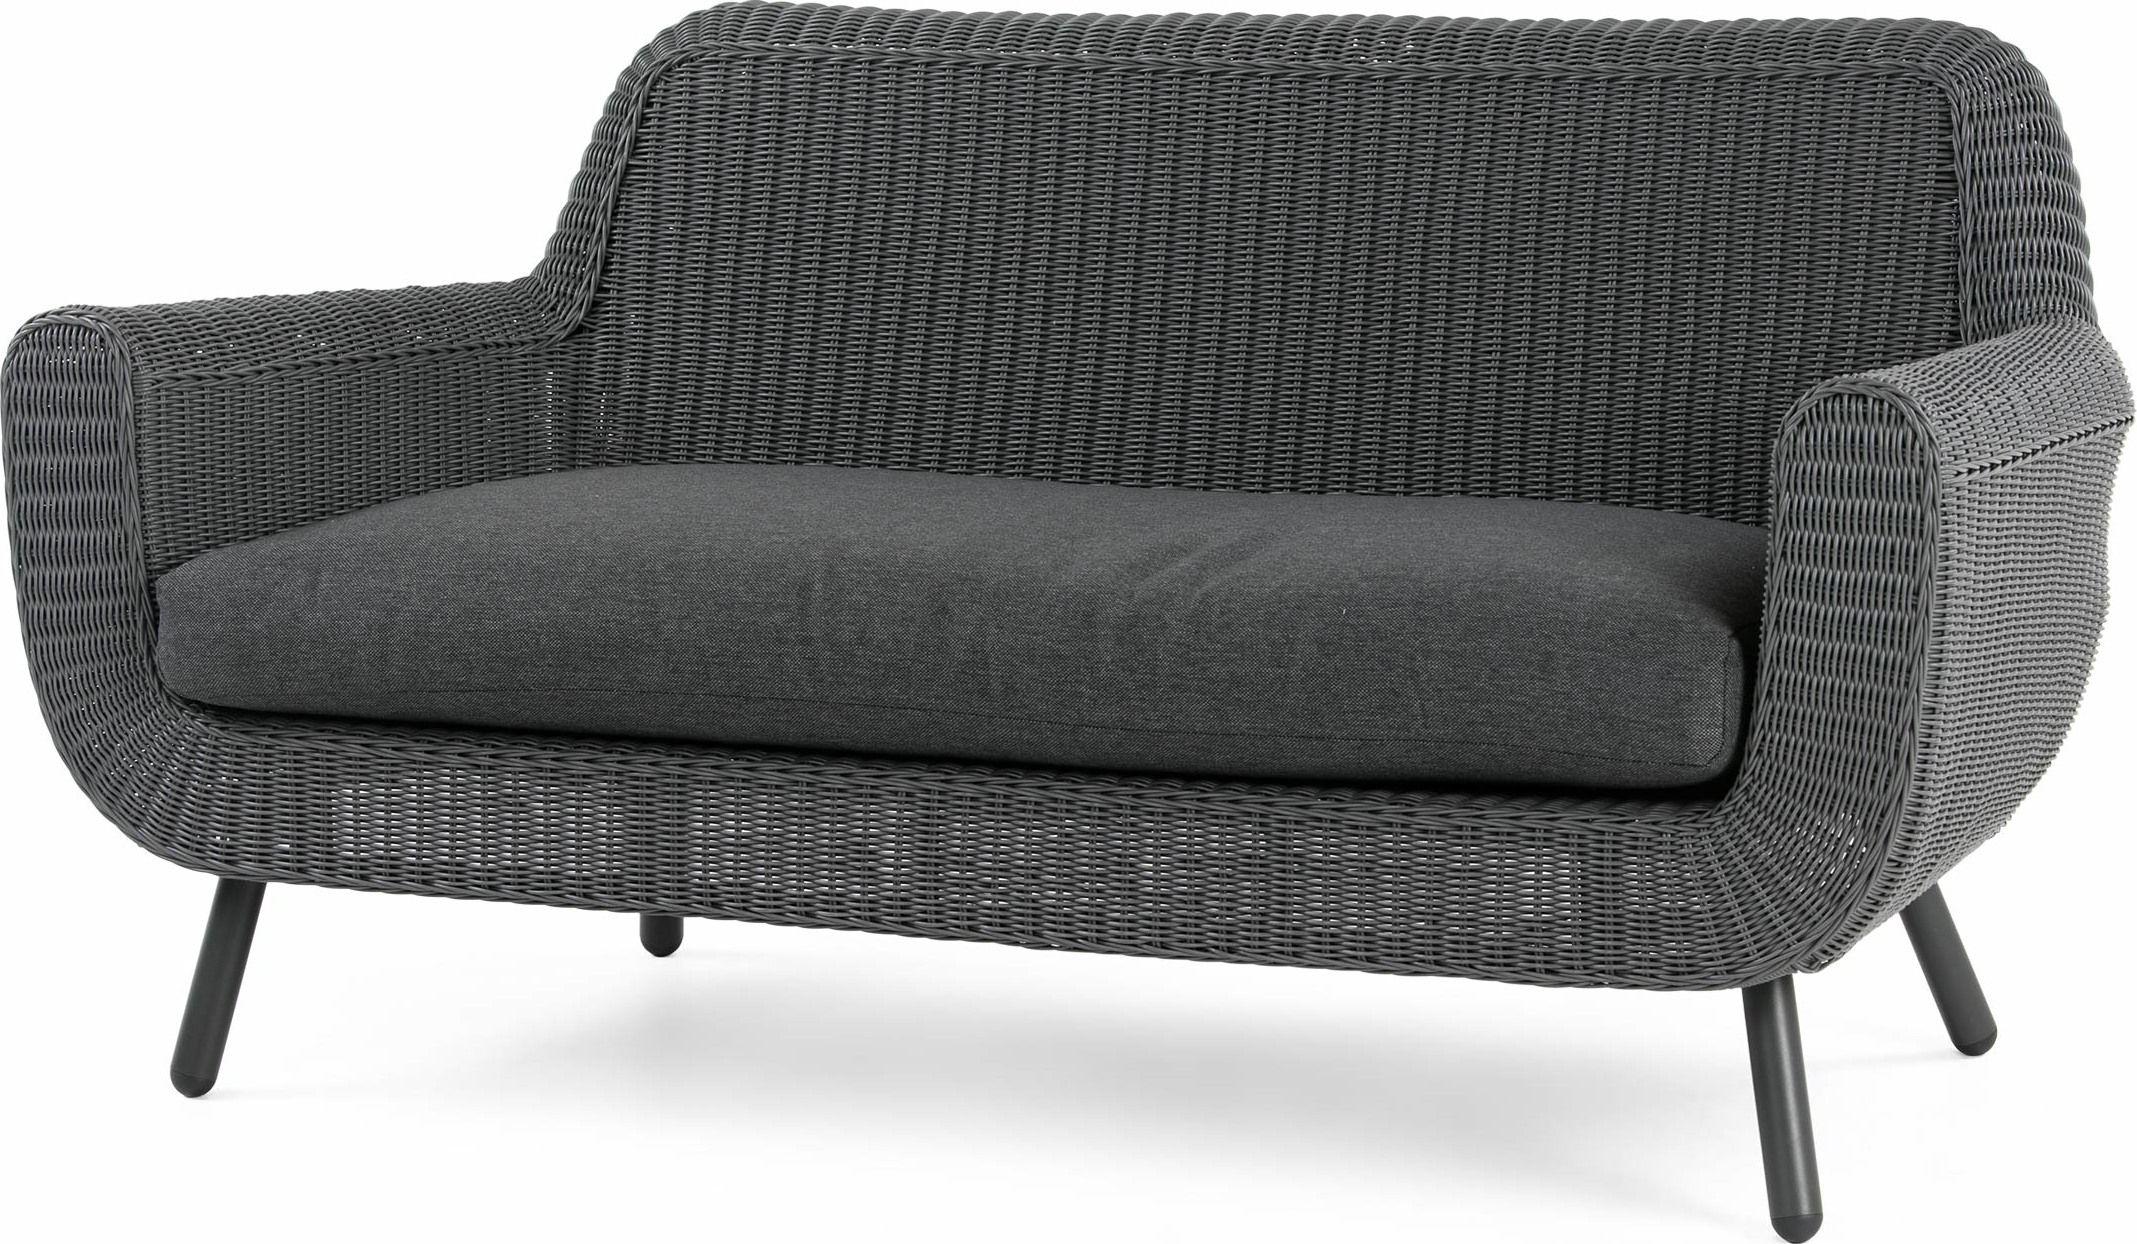 MADE Rattan Grey Sofa | Products | Garden sofa, Wicker sofa ...